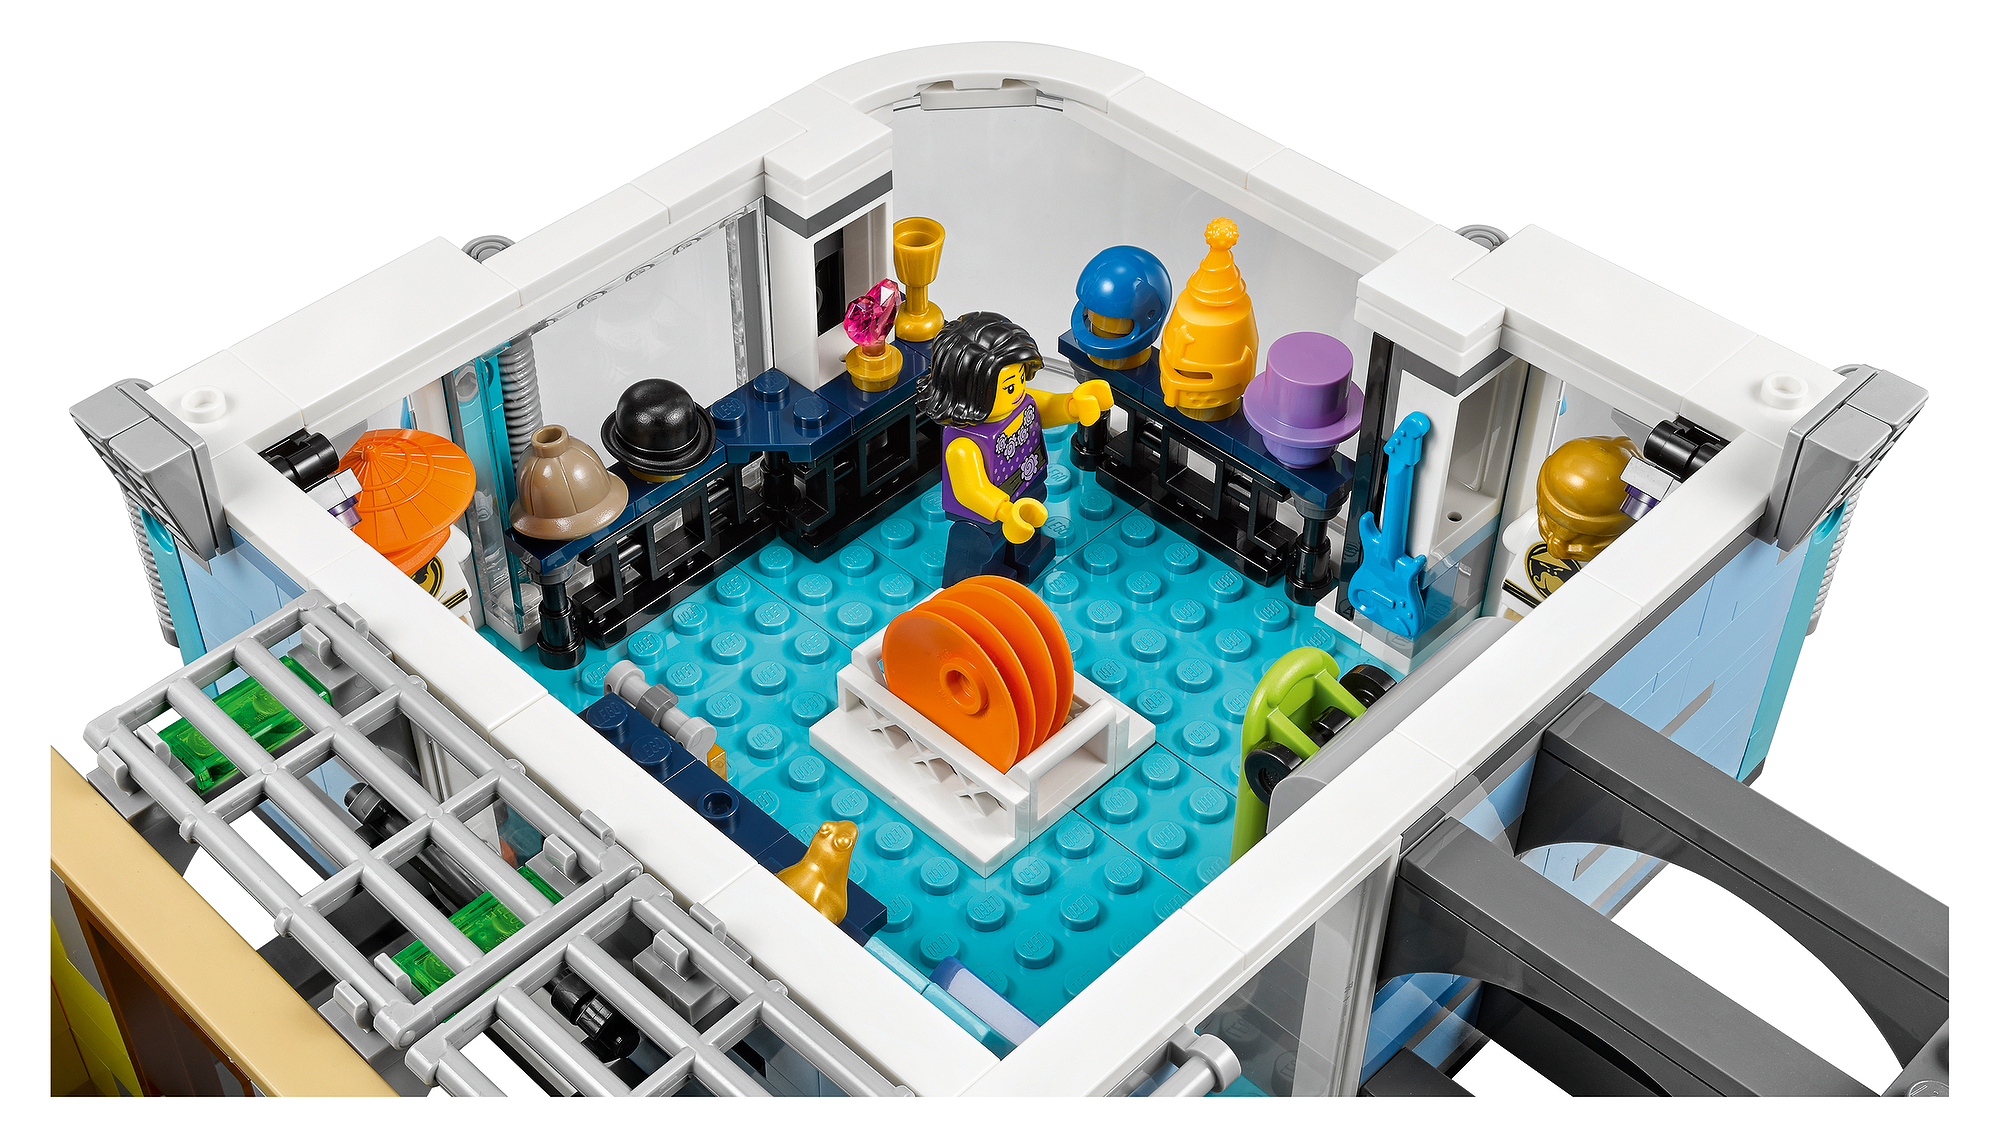 Lego Reveals 70620 Ninjago City The Massive Modular